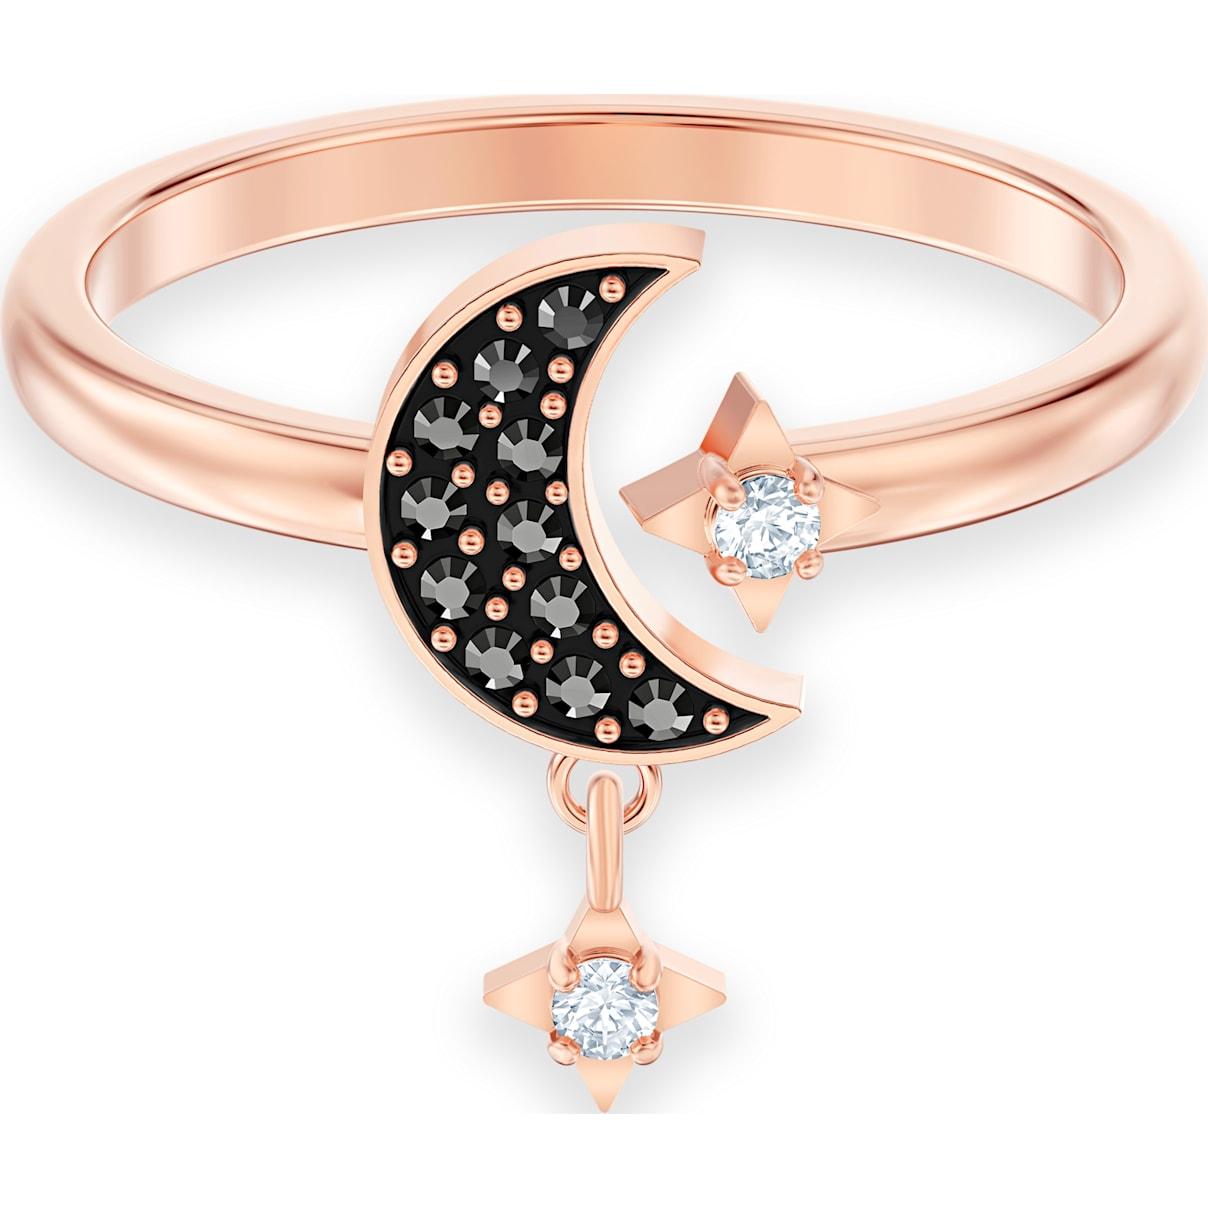 Swarovski Swarovski Symbolic Moon Motif Ring, Black, Rose-gold tone plated